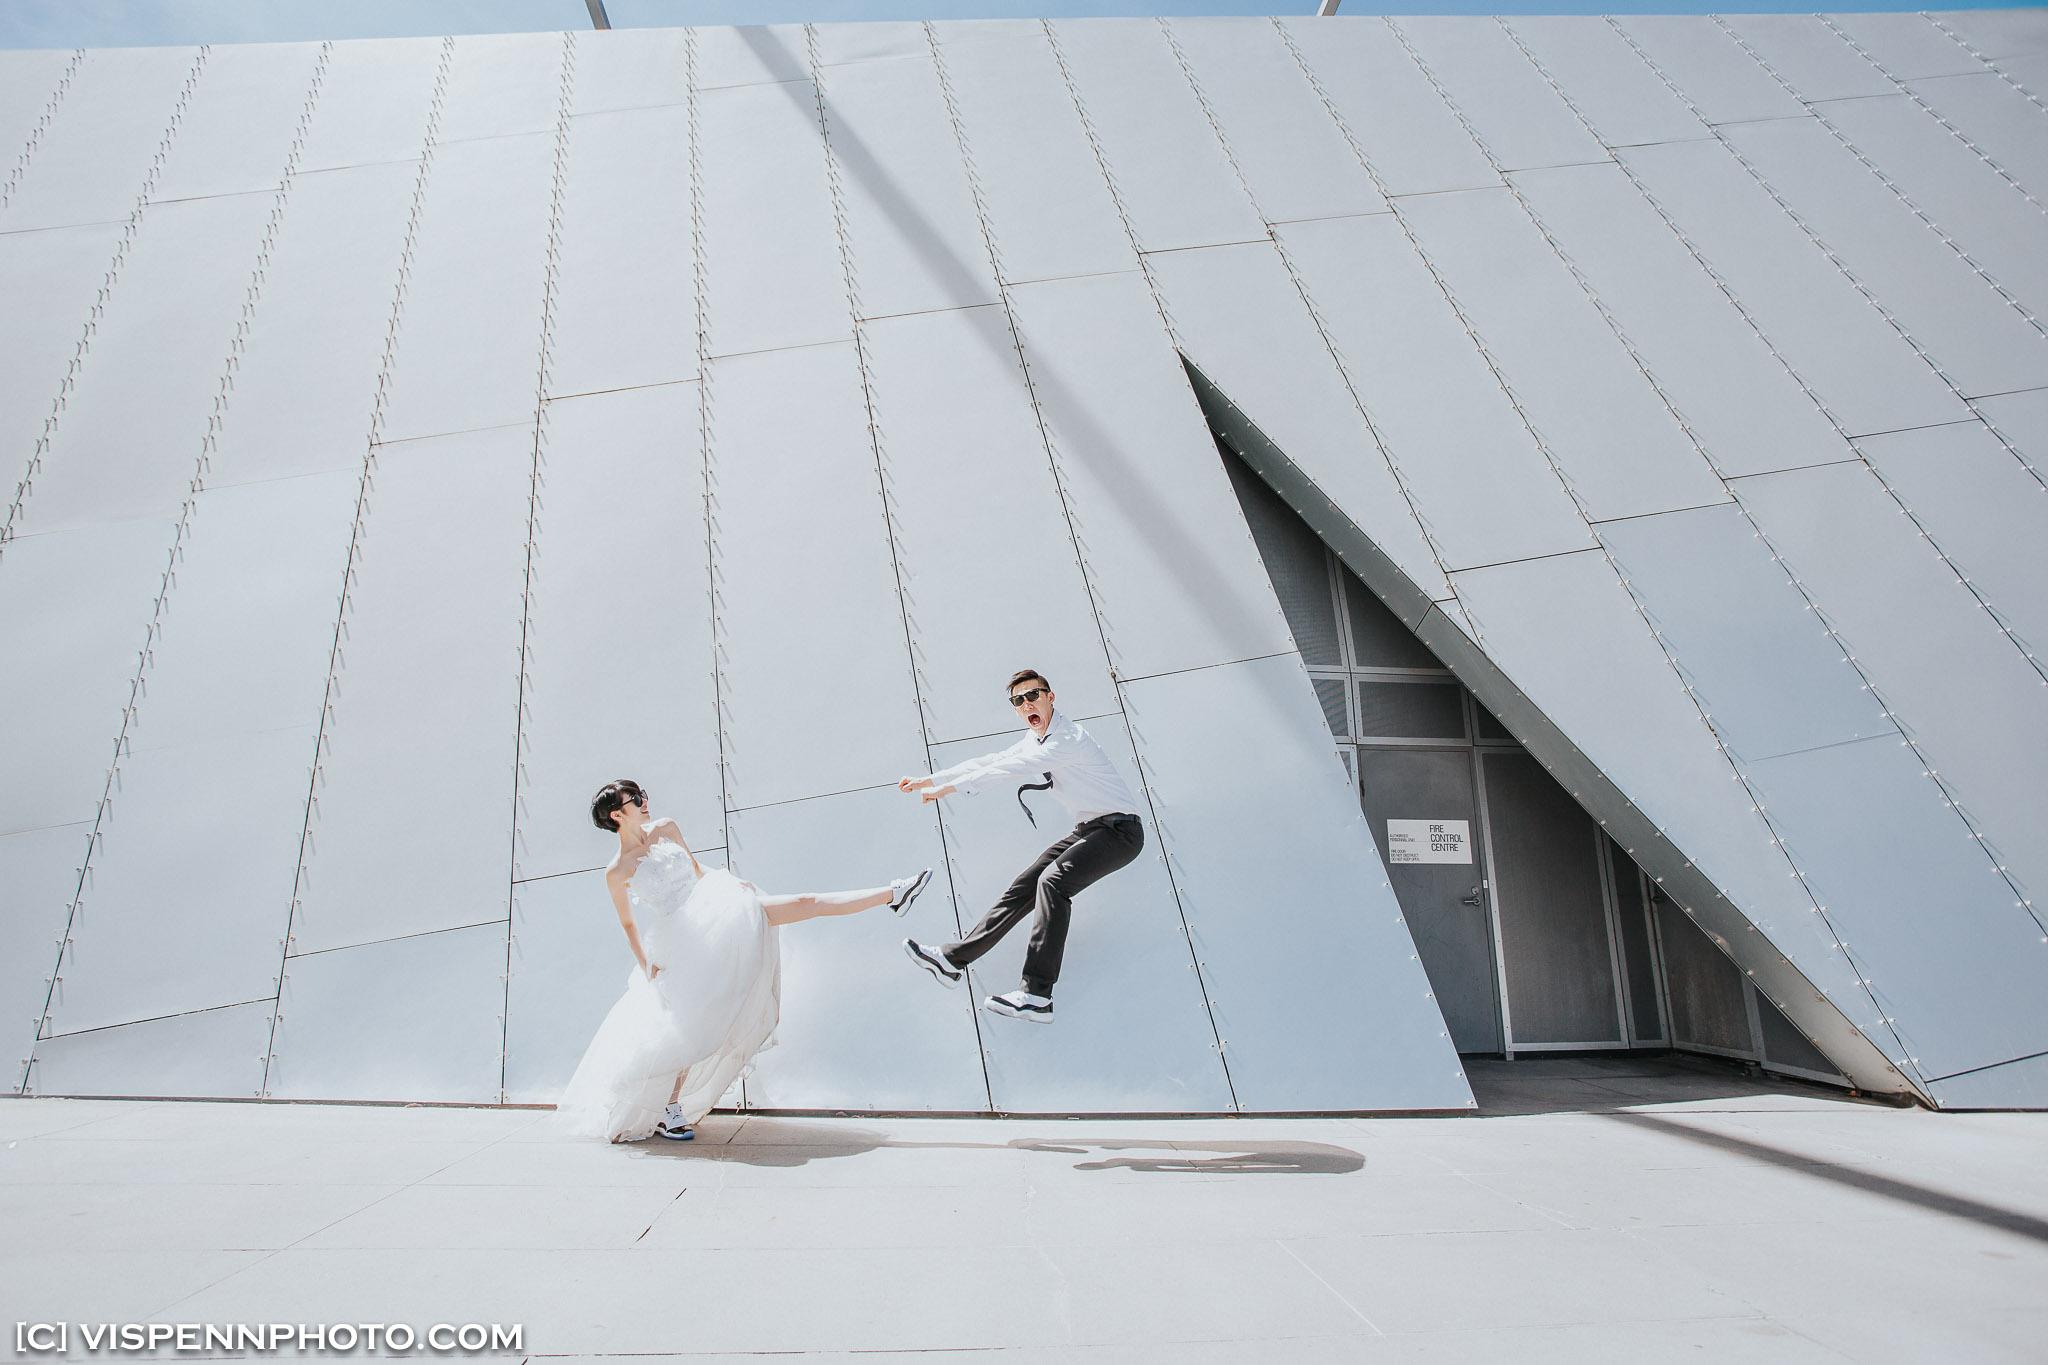 PRE WEDDING Photography Melbourne VISPENN 墨尔本 婚纱照 结婚照 婚纱摄影 Ivy PreWedding 2518